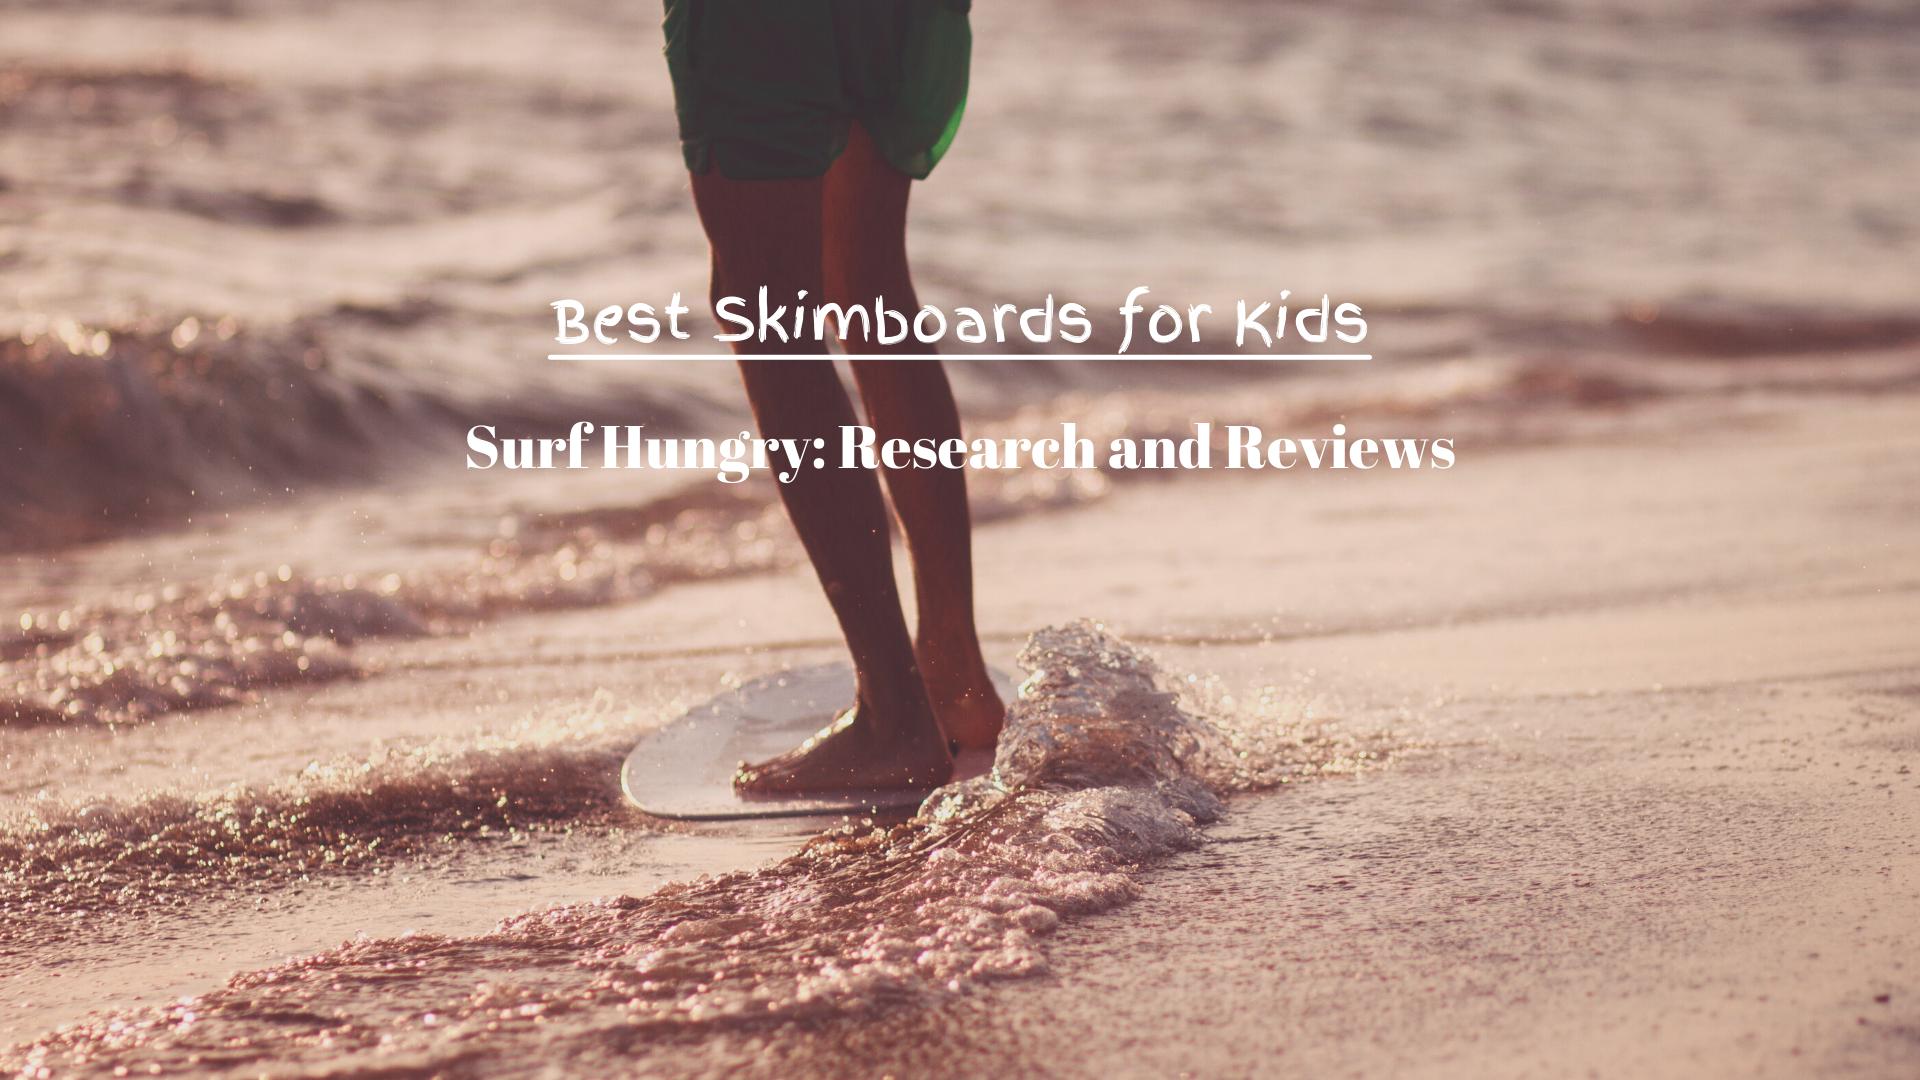 Best Skimboards for Kids